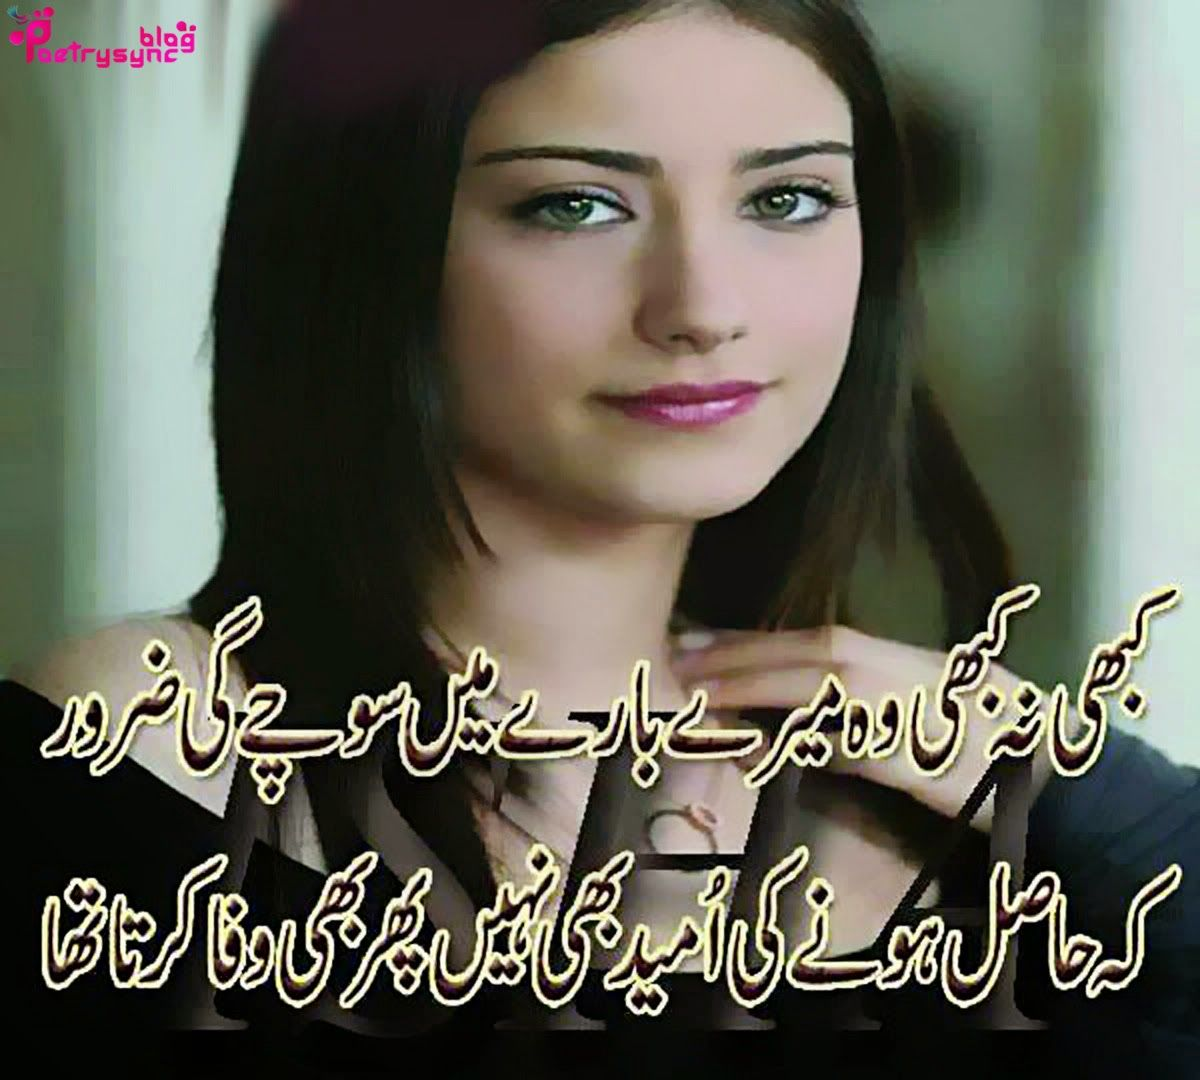 Sad I Miss You Quotes For Friends: Sad Shayari Kabhi Na Kabhi Wo Mery Bary Mein Sochy Gi